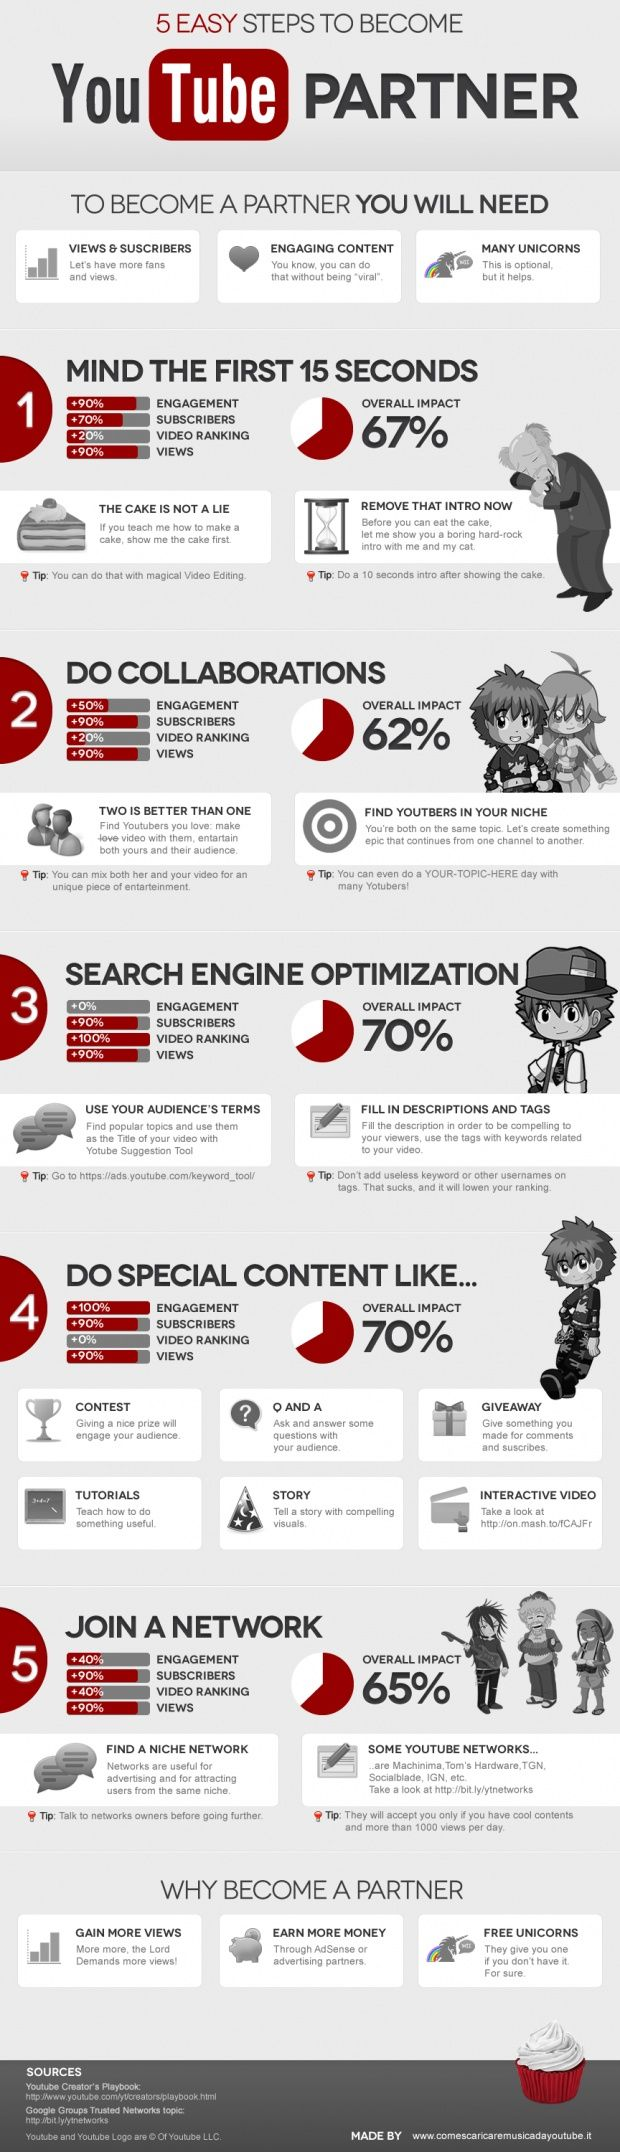 5 easy steps to become #youtube partner #infographic #socialmedia http:/rubendelaosa.com @rubendelaosa